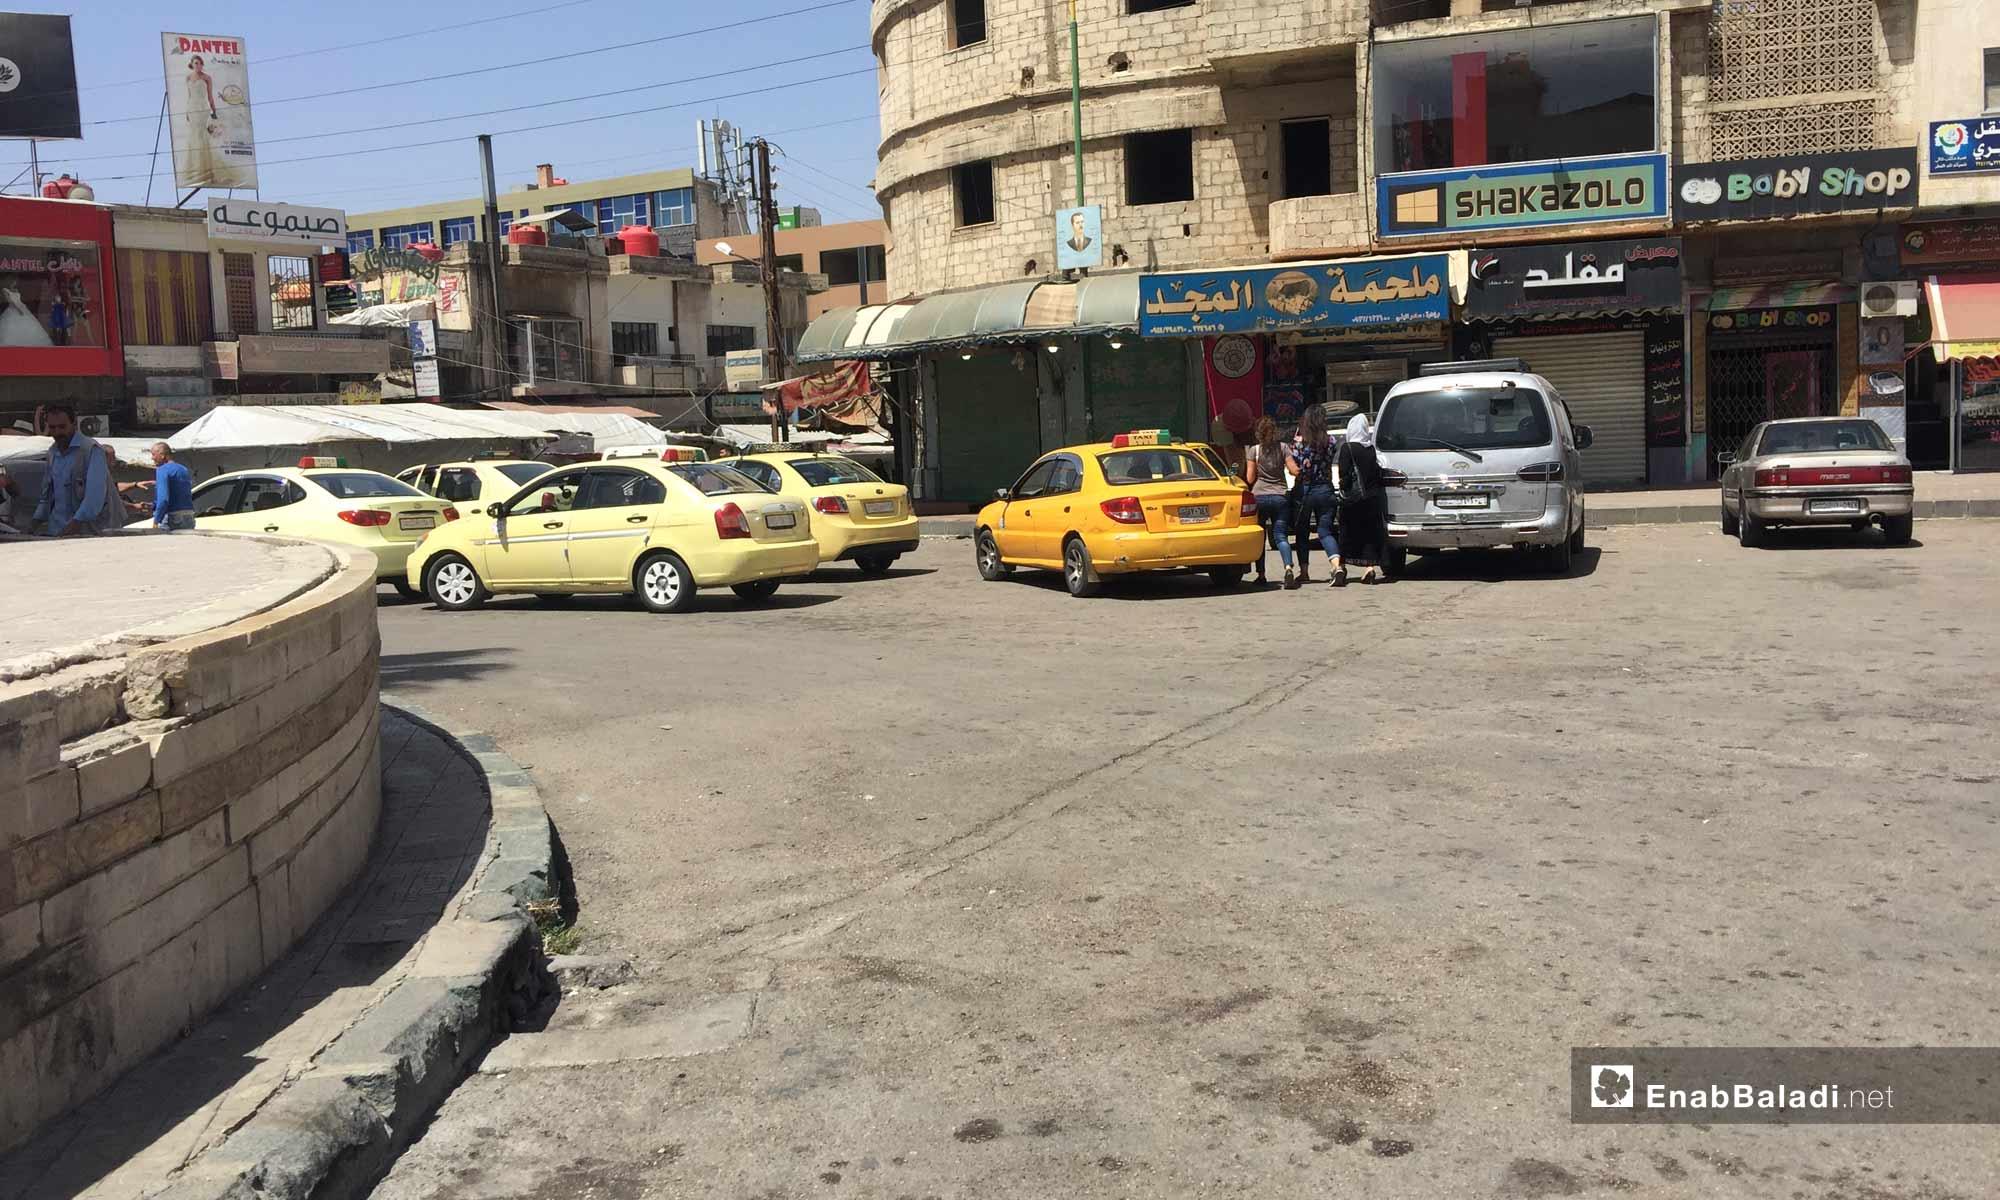 The traffic square in the city of As-Suwayda – July 26, 2018 (Enab Baladi)